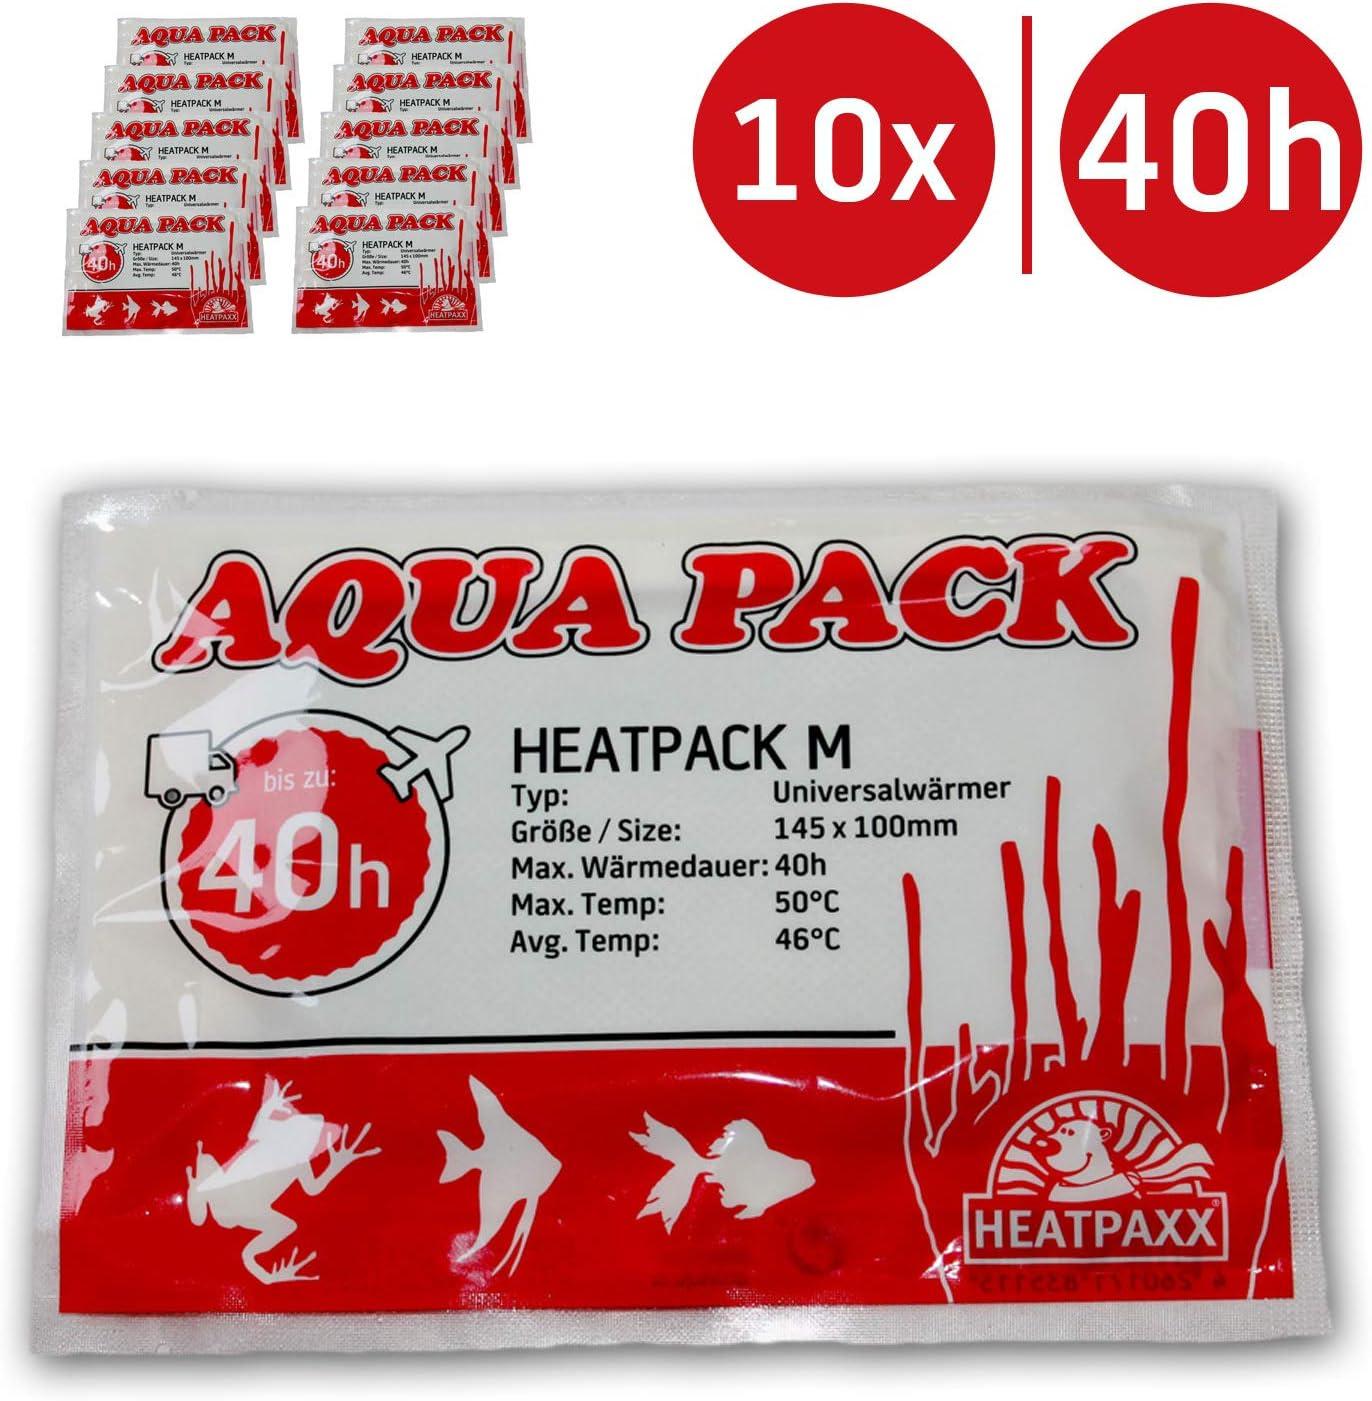 HeatPaxx UNIVER salwärmer | Heat Pack M 40H | Aqua Pack ...